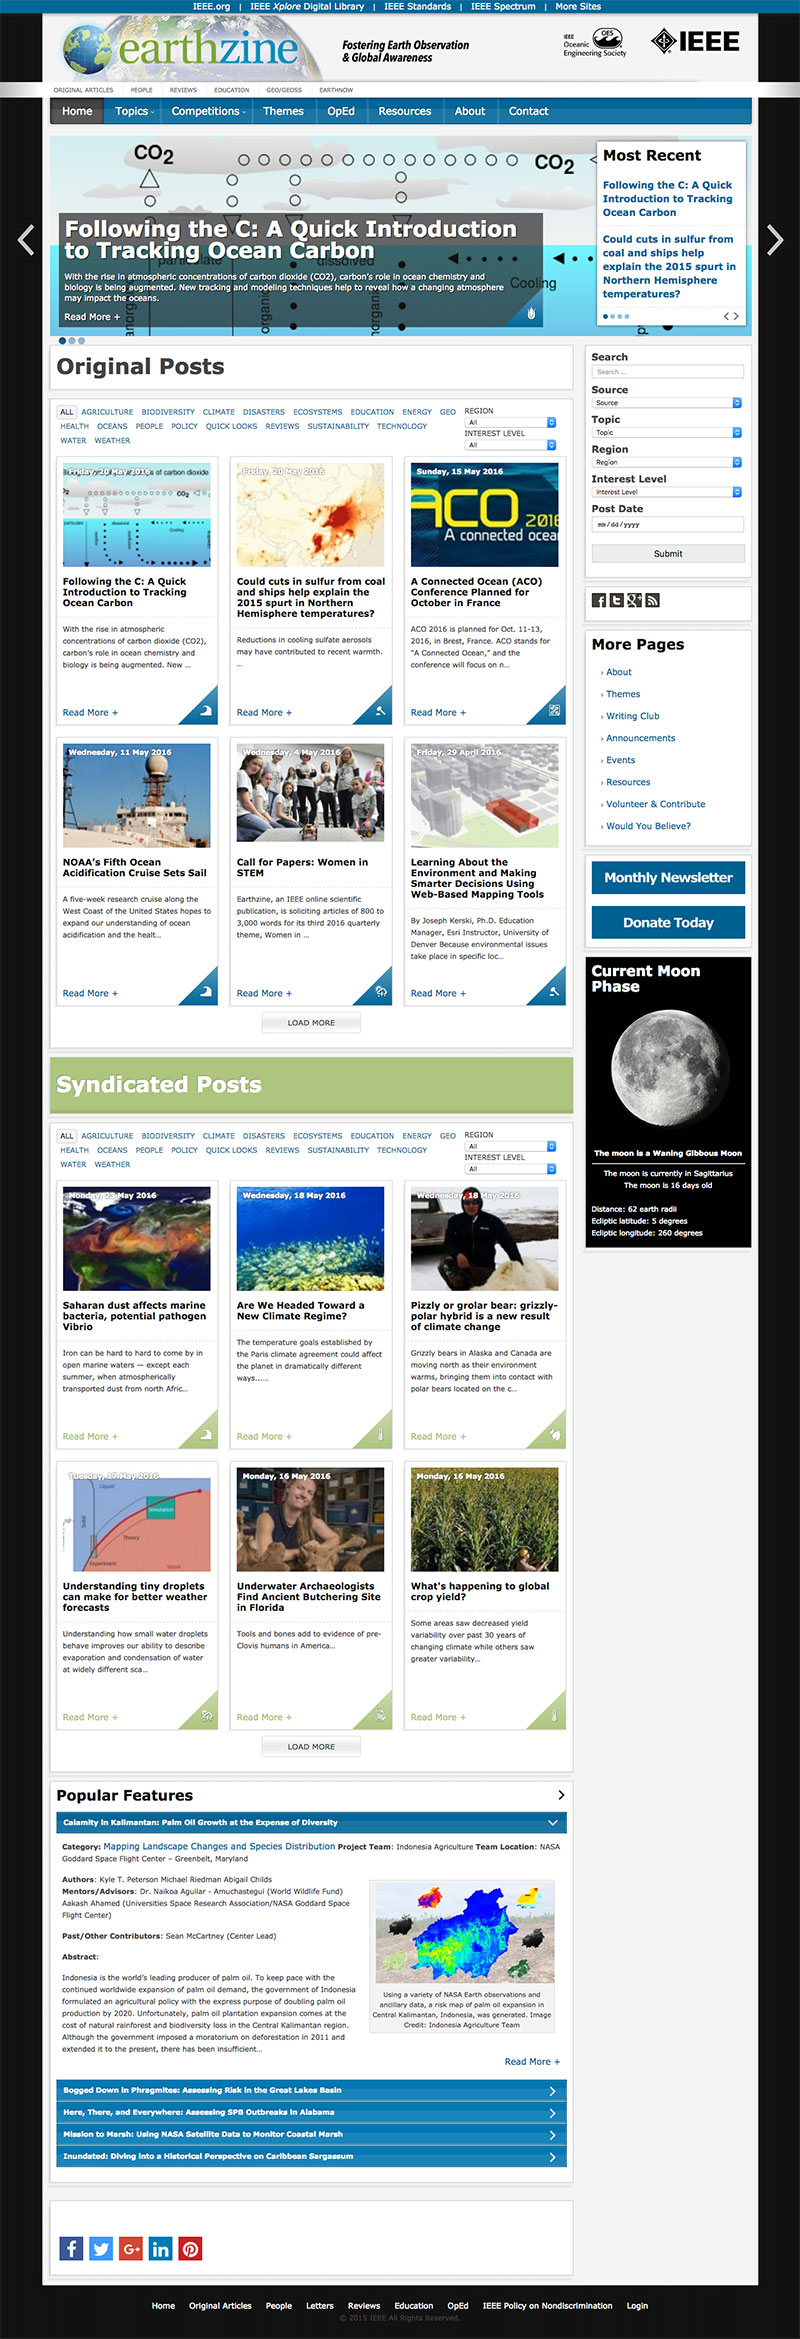 Earthzine homepage